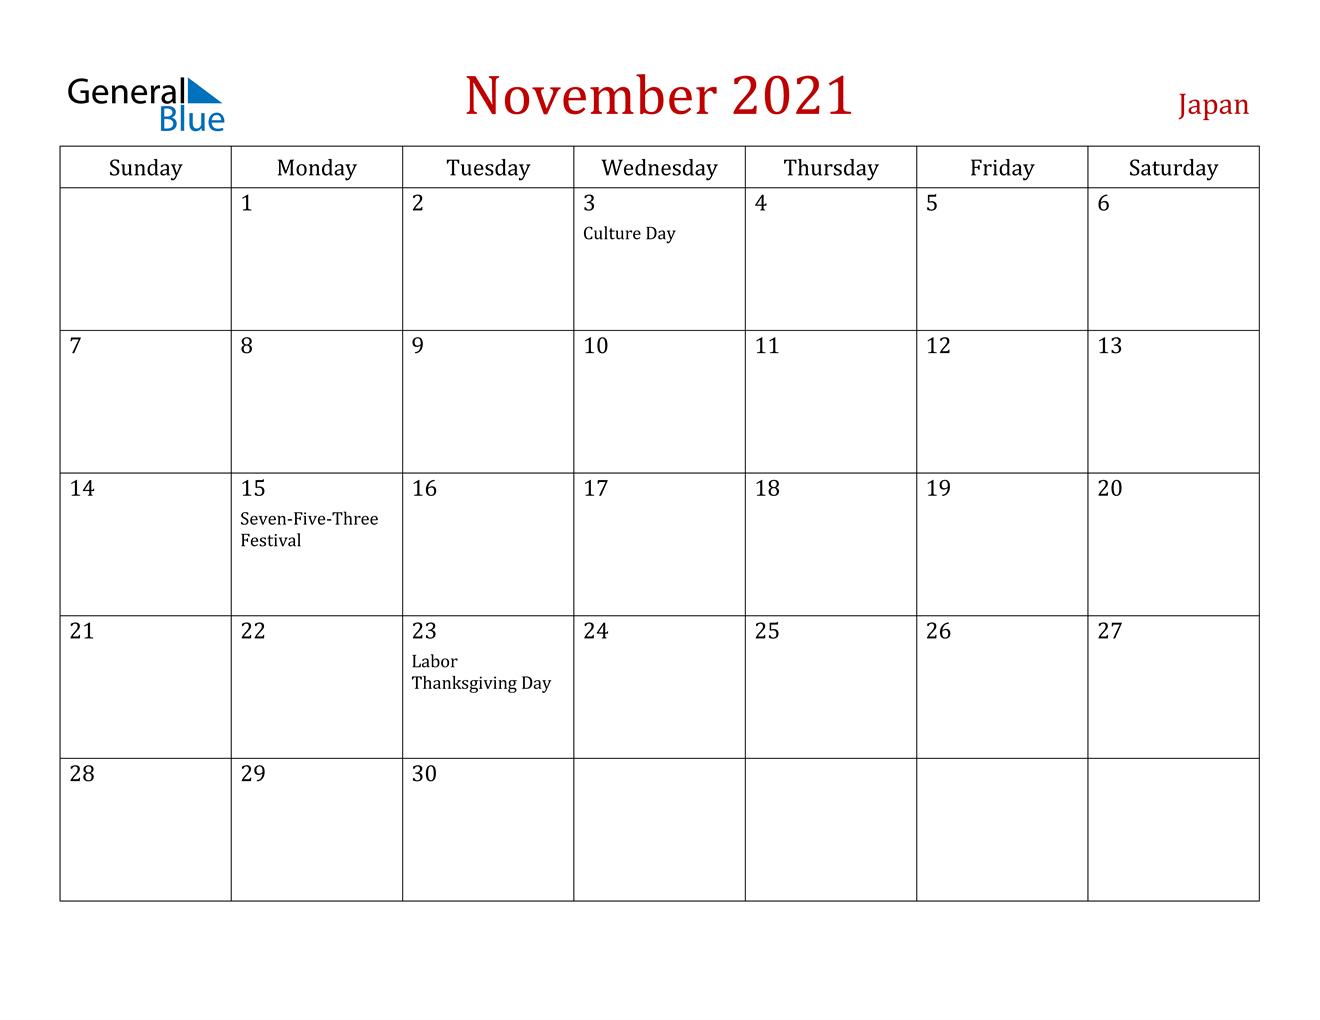 November 2021 Calendar - Japan